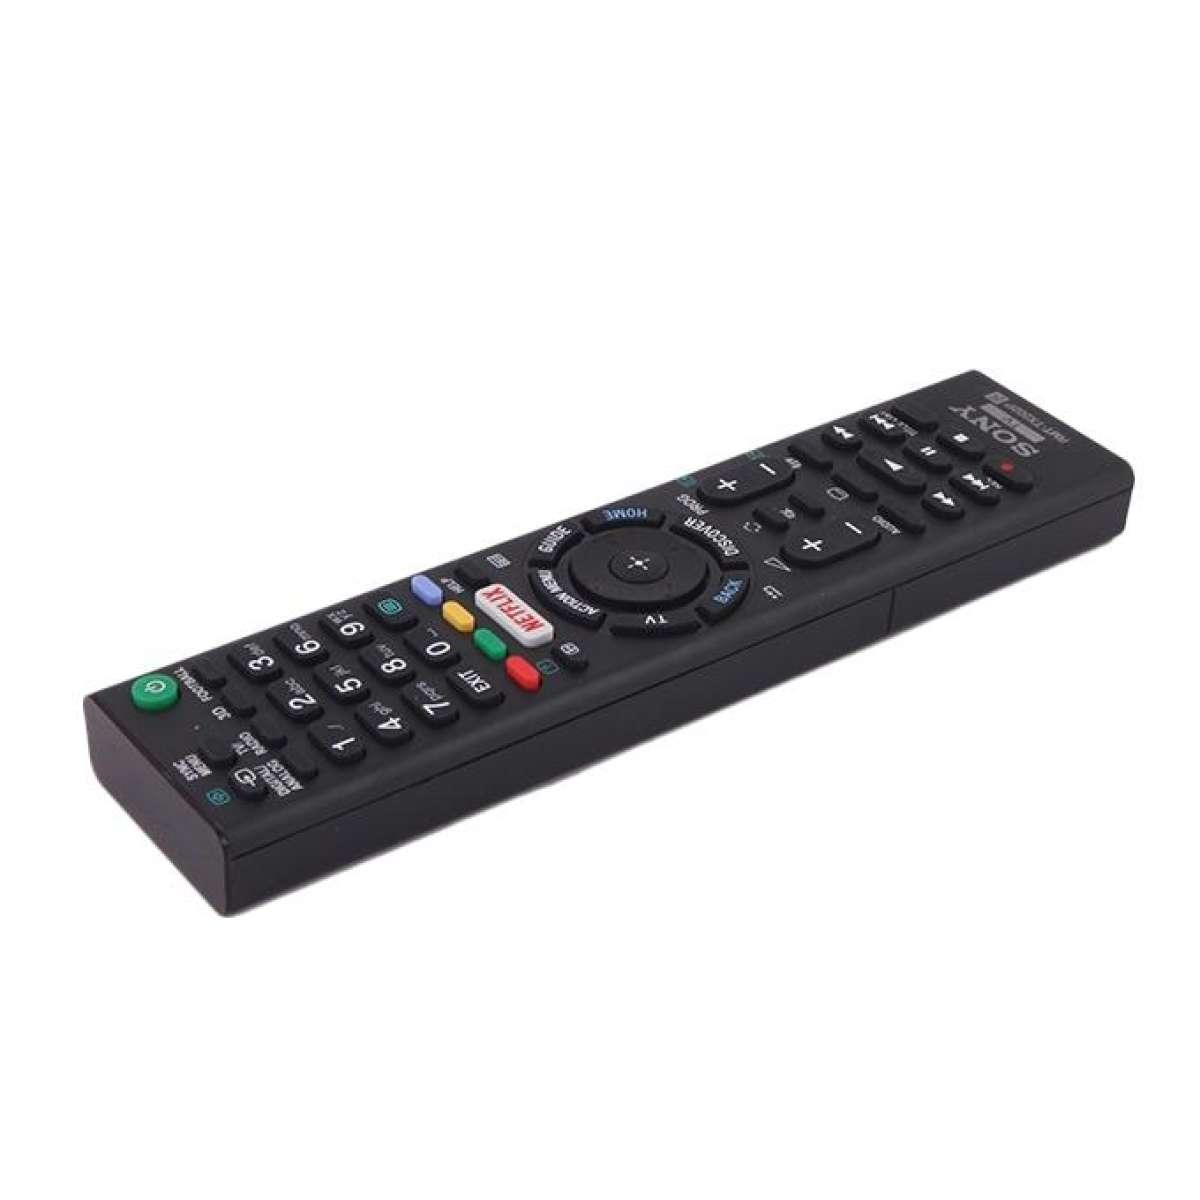 TV Remote Control In Bangladesh At Best Price - Daraz com bd